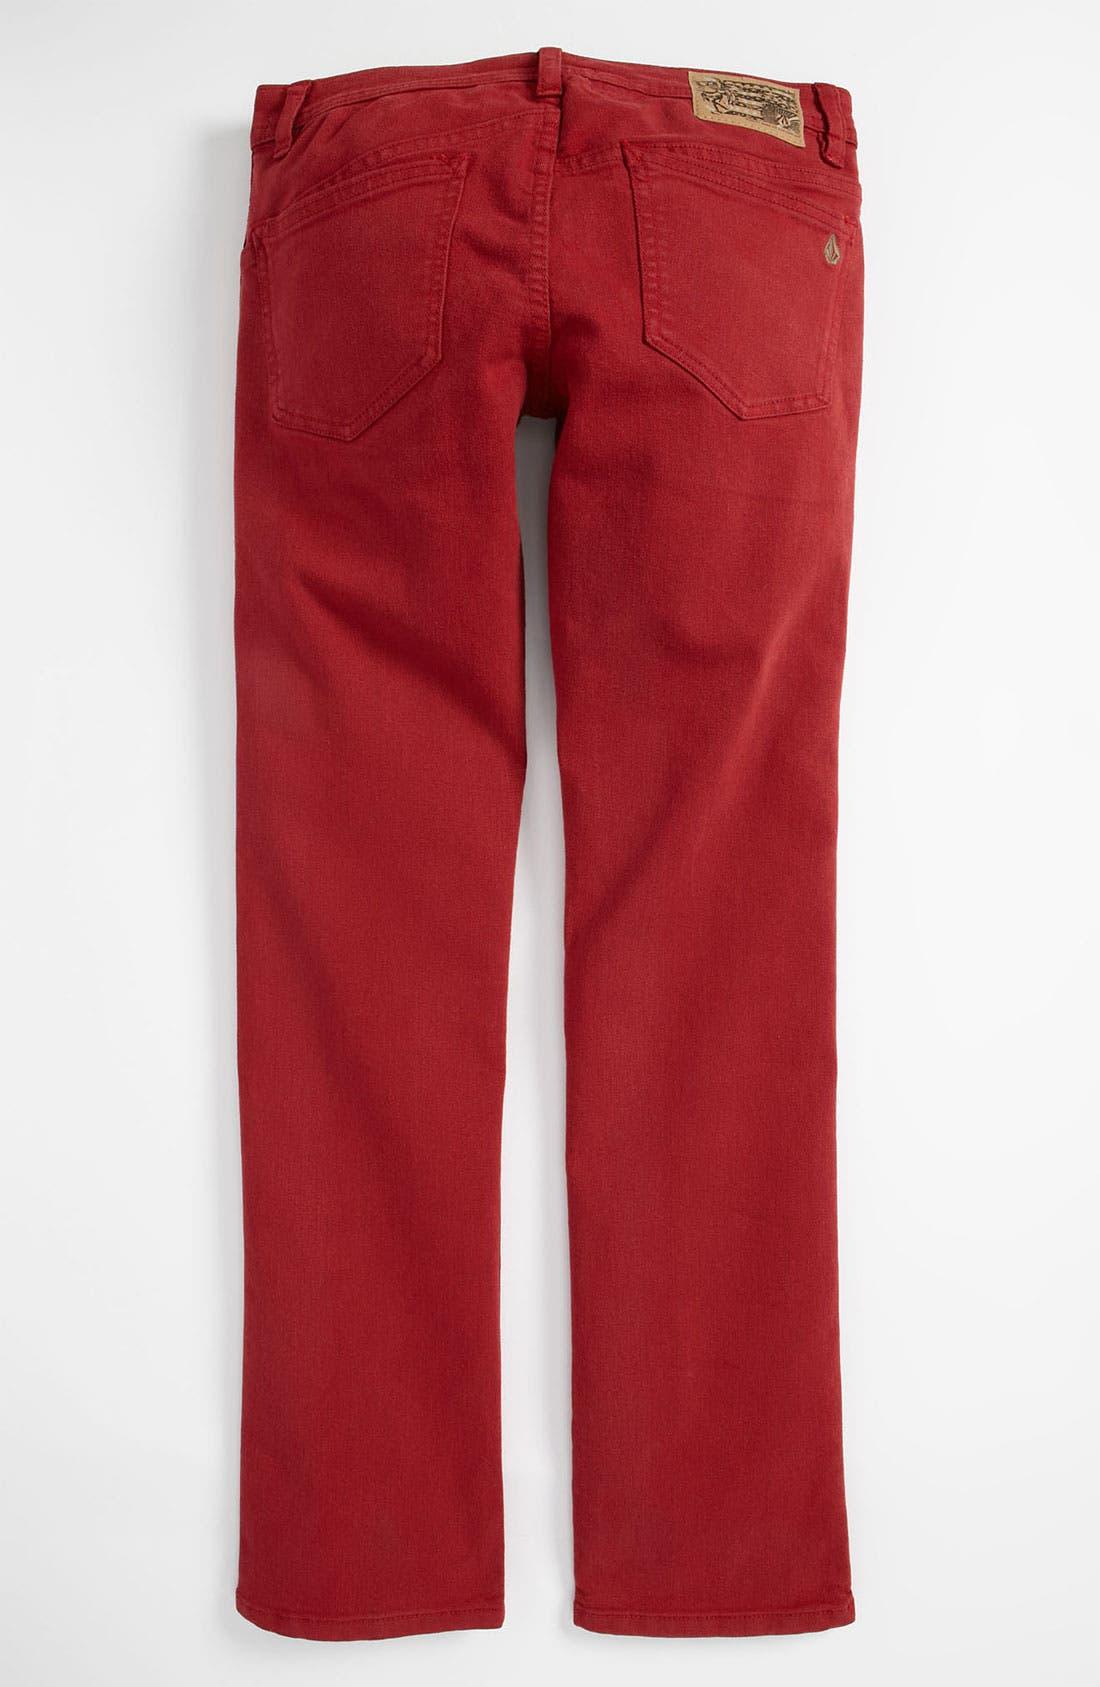 Main Image - Volcom '2x4' Skinny Jeans (Big Boys)